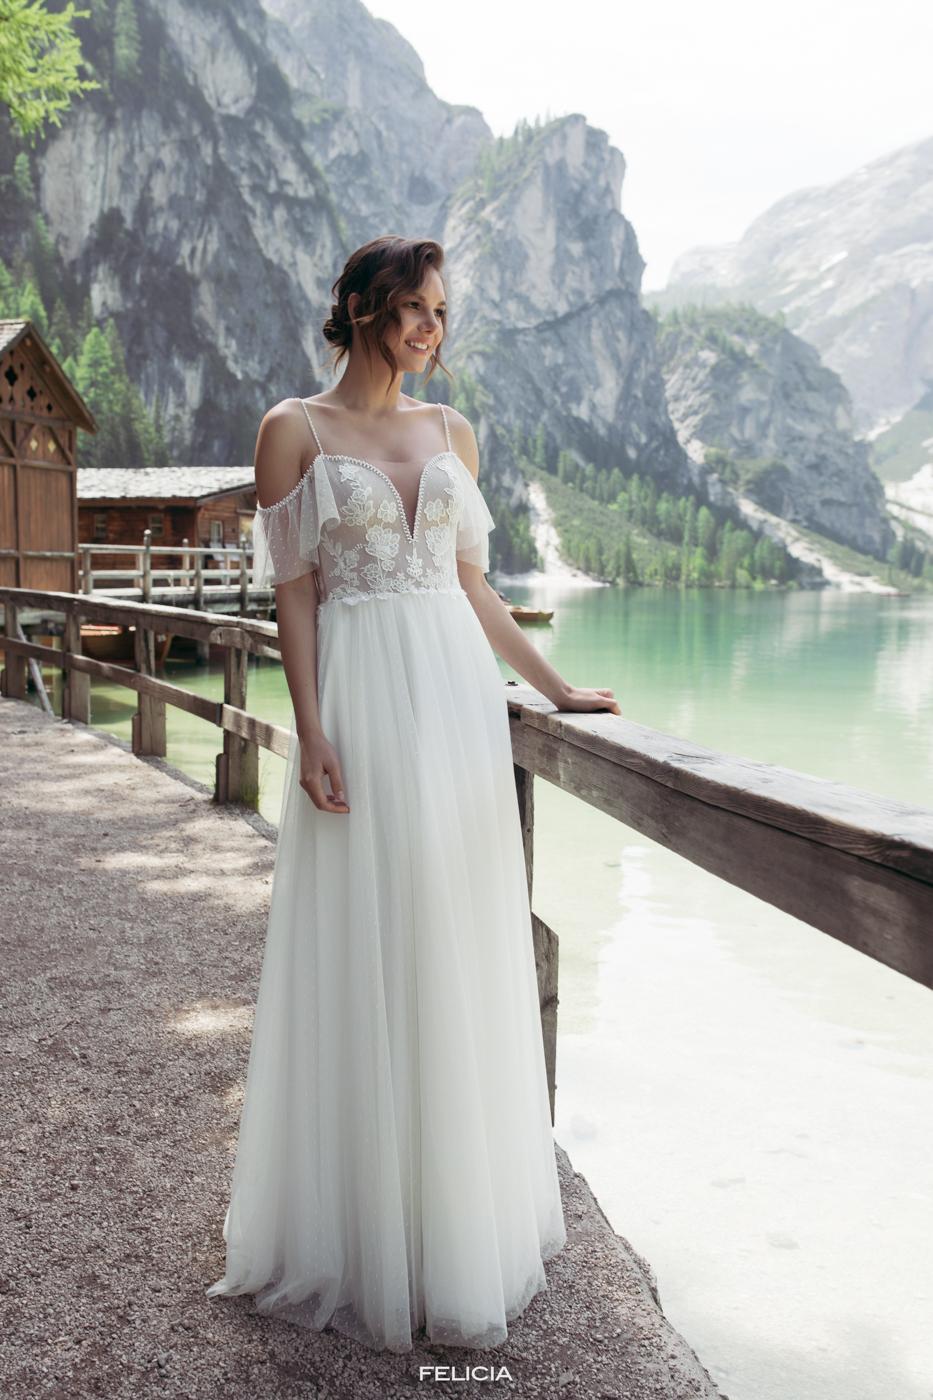 Le Rina Brautkleider cappuchino München bei myLovely Softtüll elegant high quality